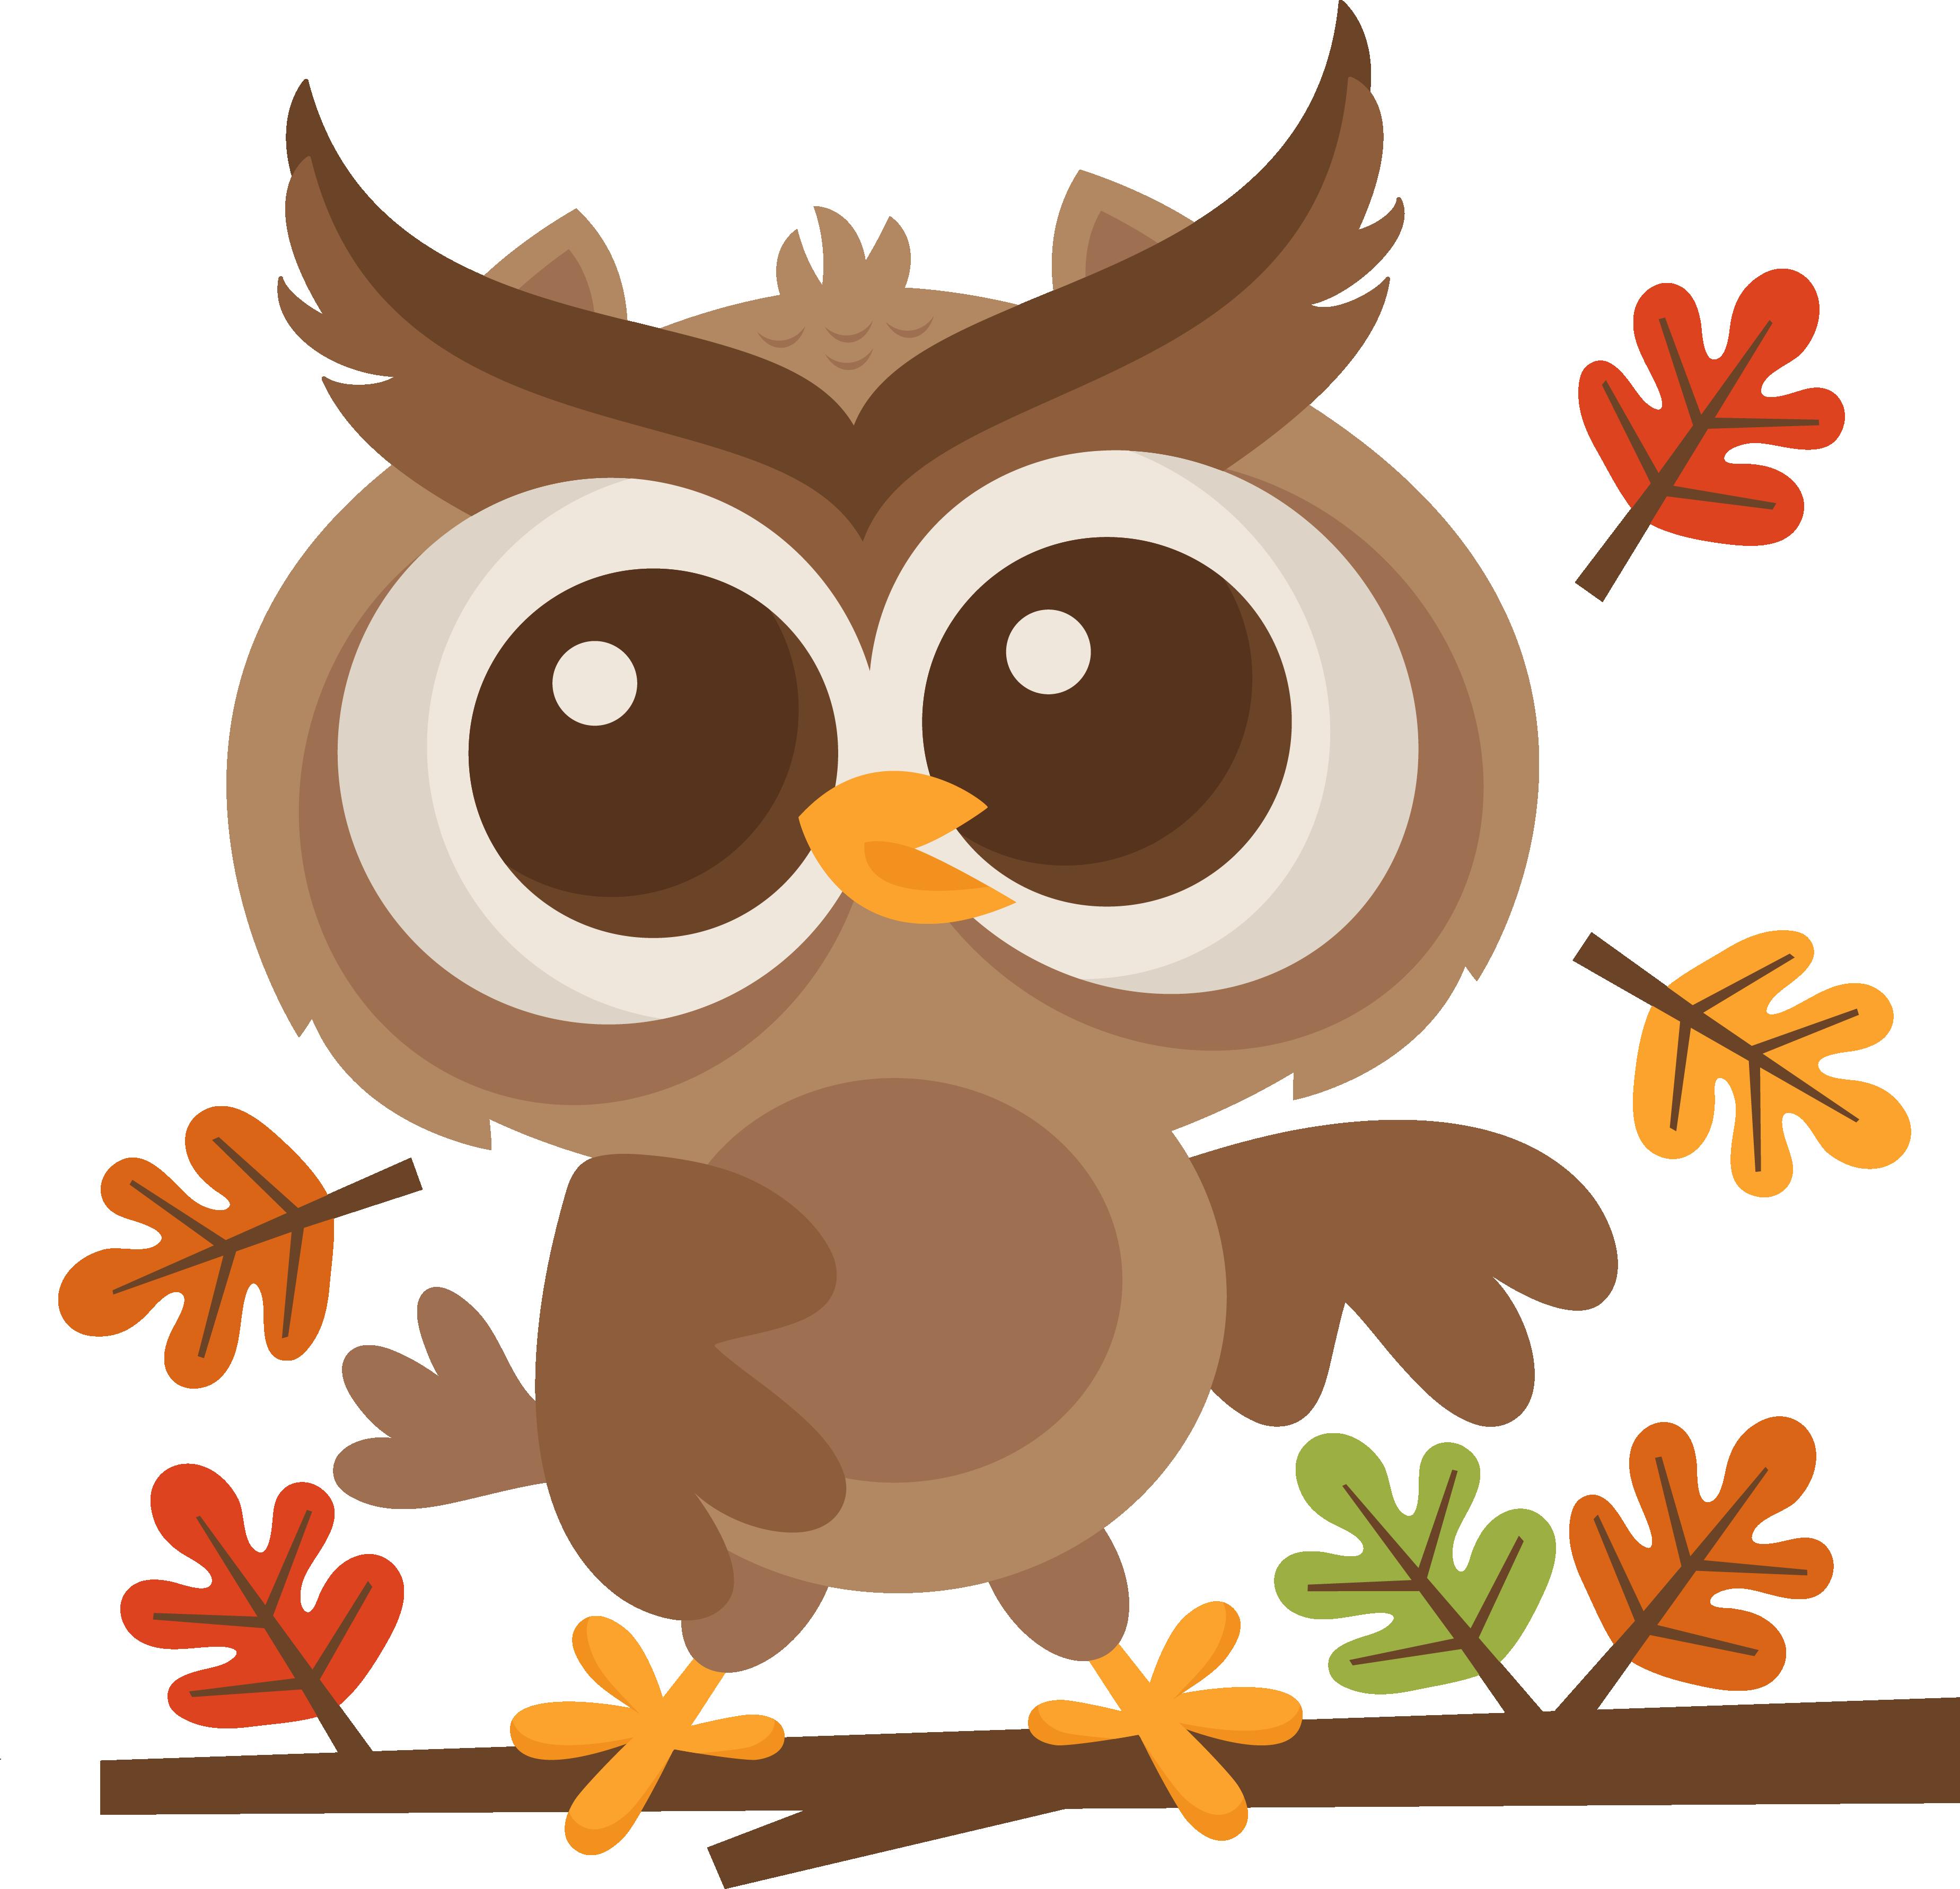 Nest clipart owl nest. Mkc fallowlonbranch svg s